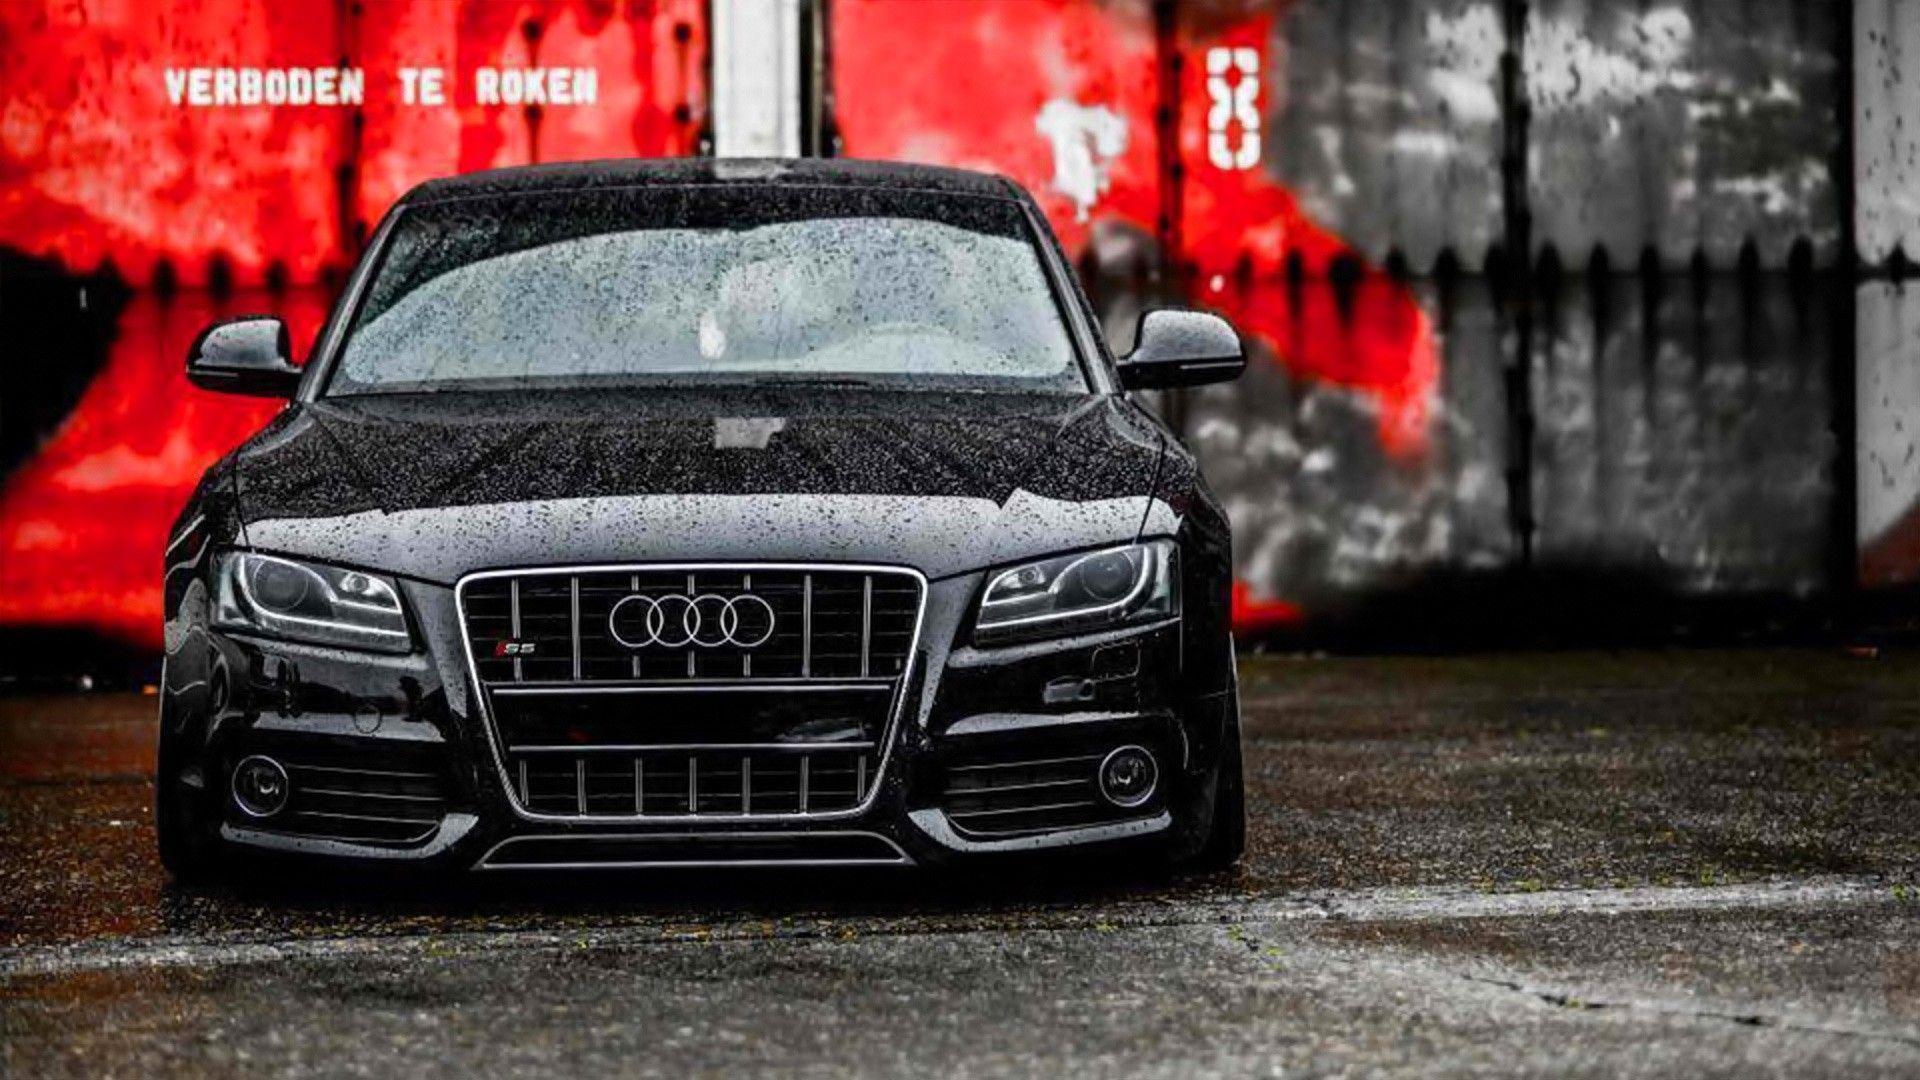 8k Ultra Hd Audi Wallpapers Top Free 8k Ultra Hd Audi Backgrounds